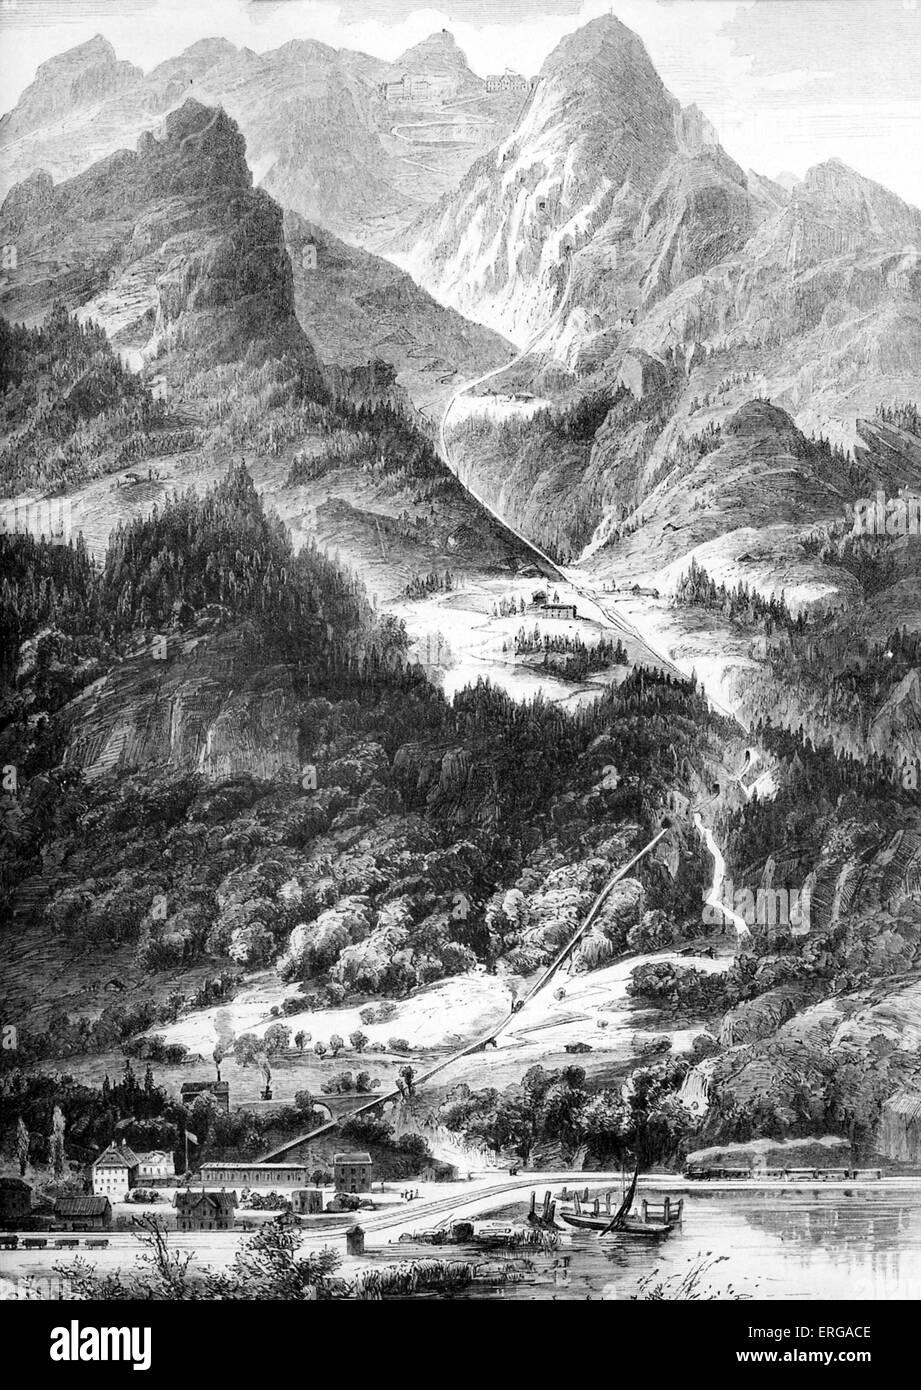 The Pilatus Railway (Pilatusbahn) is a mountain railway in Switzerland and is the steepest rack railway in the world, - Stock Image